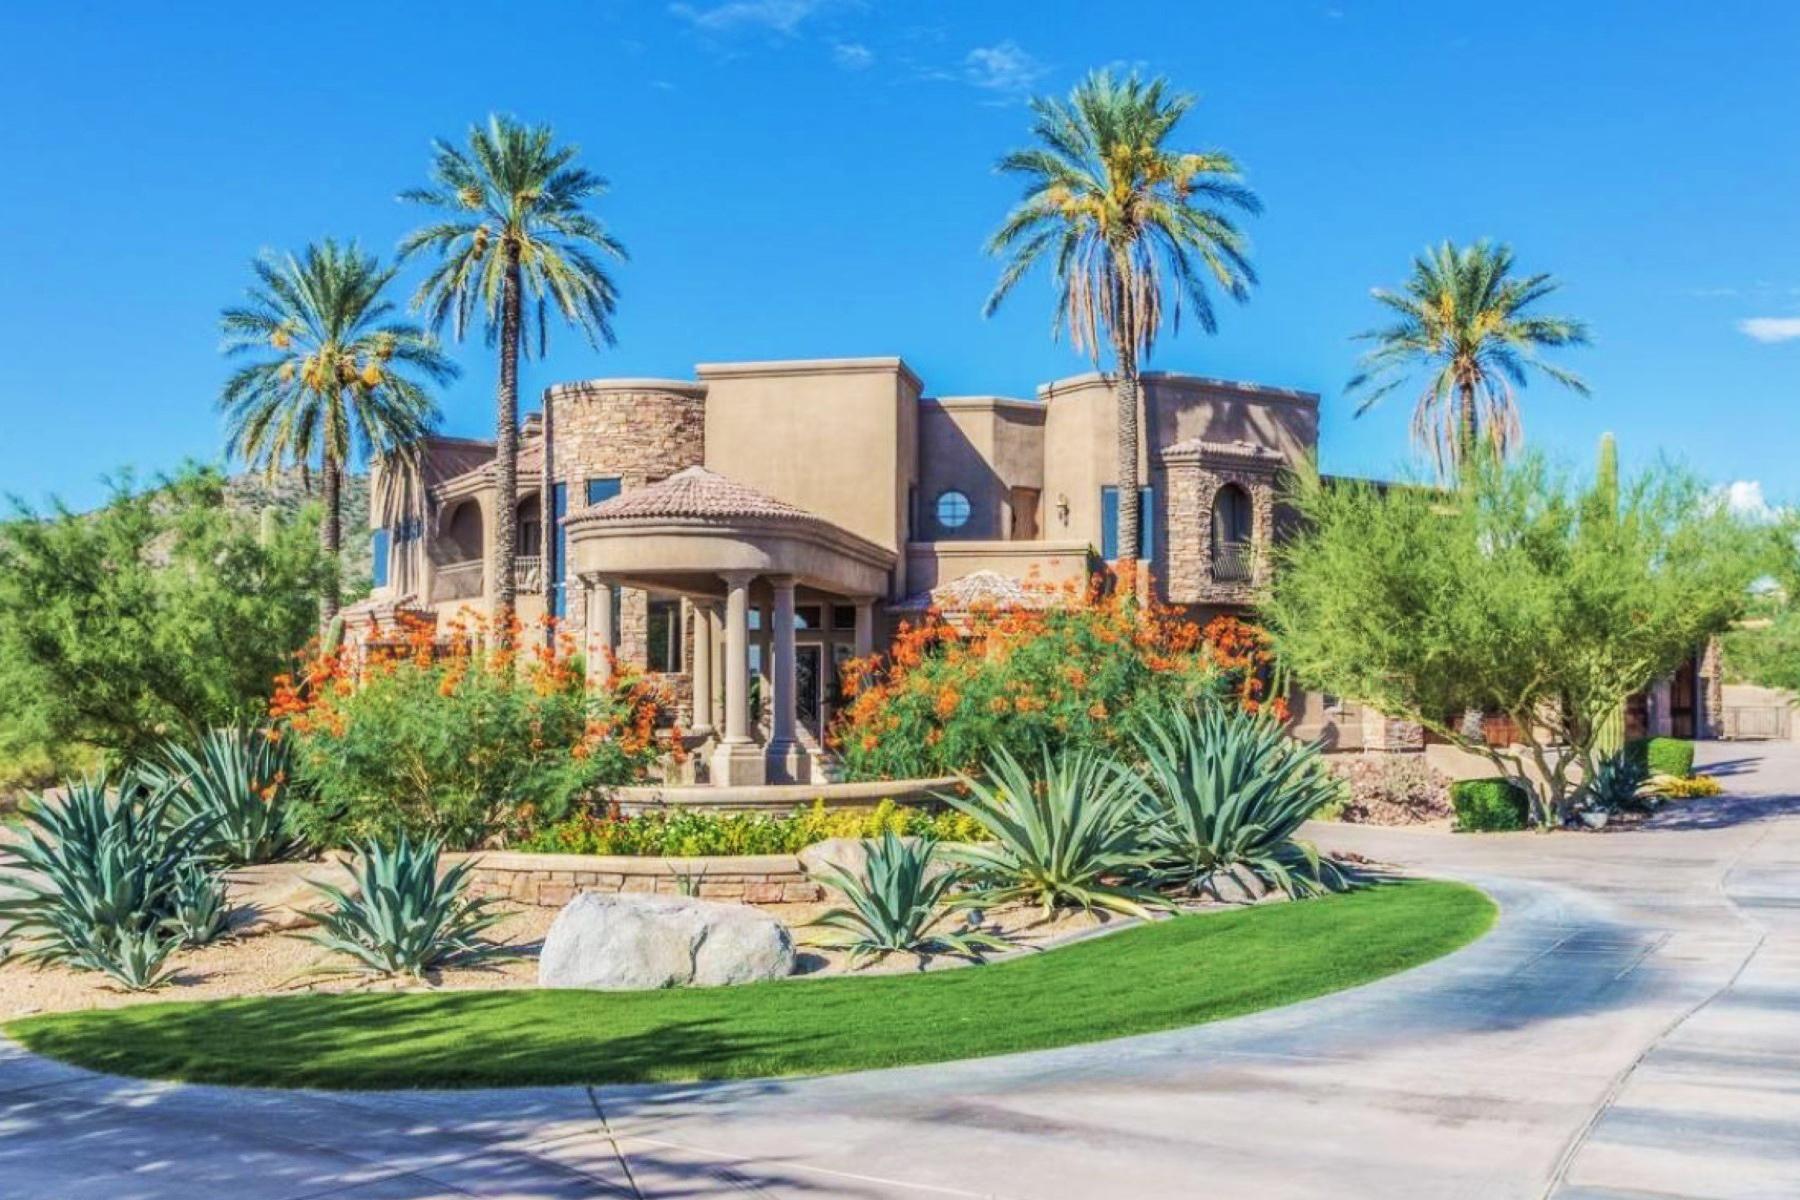 Nhà ở một gia đình vì Bán tại Absolute Perfection On Privately Gated Well Appointed Estate On 1.4 Acres 8744 E Oak Street Mesa, Arizona 85207 Hoa Kỳ